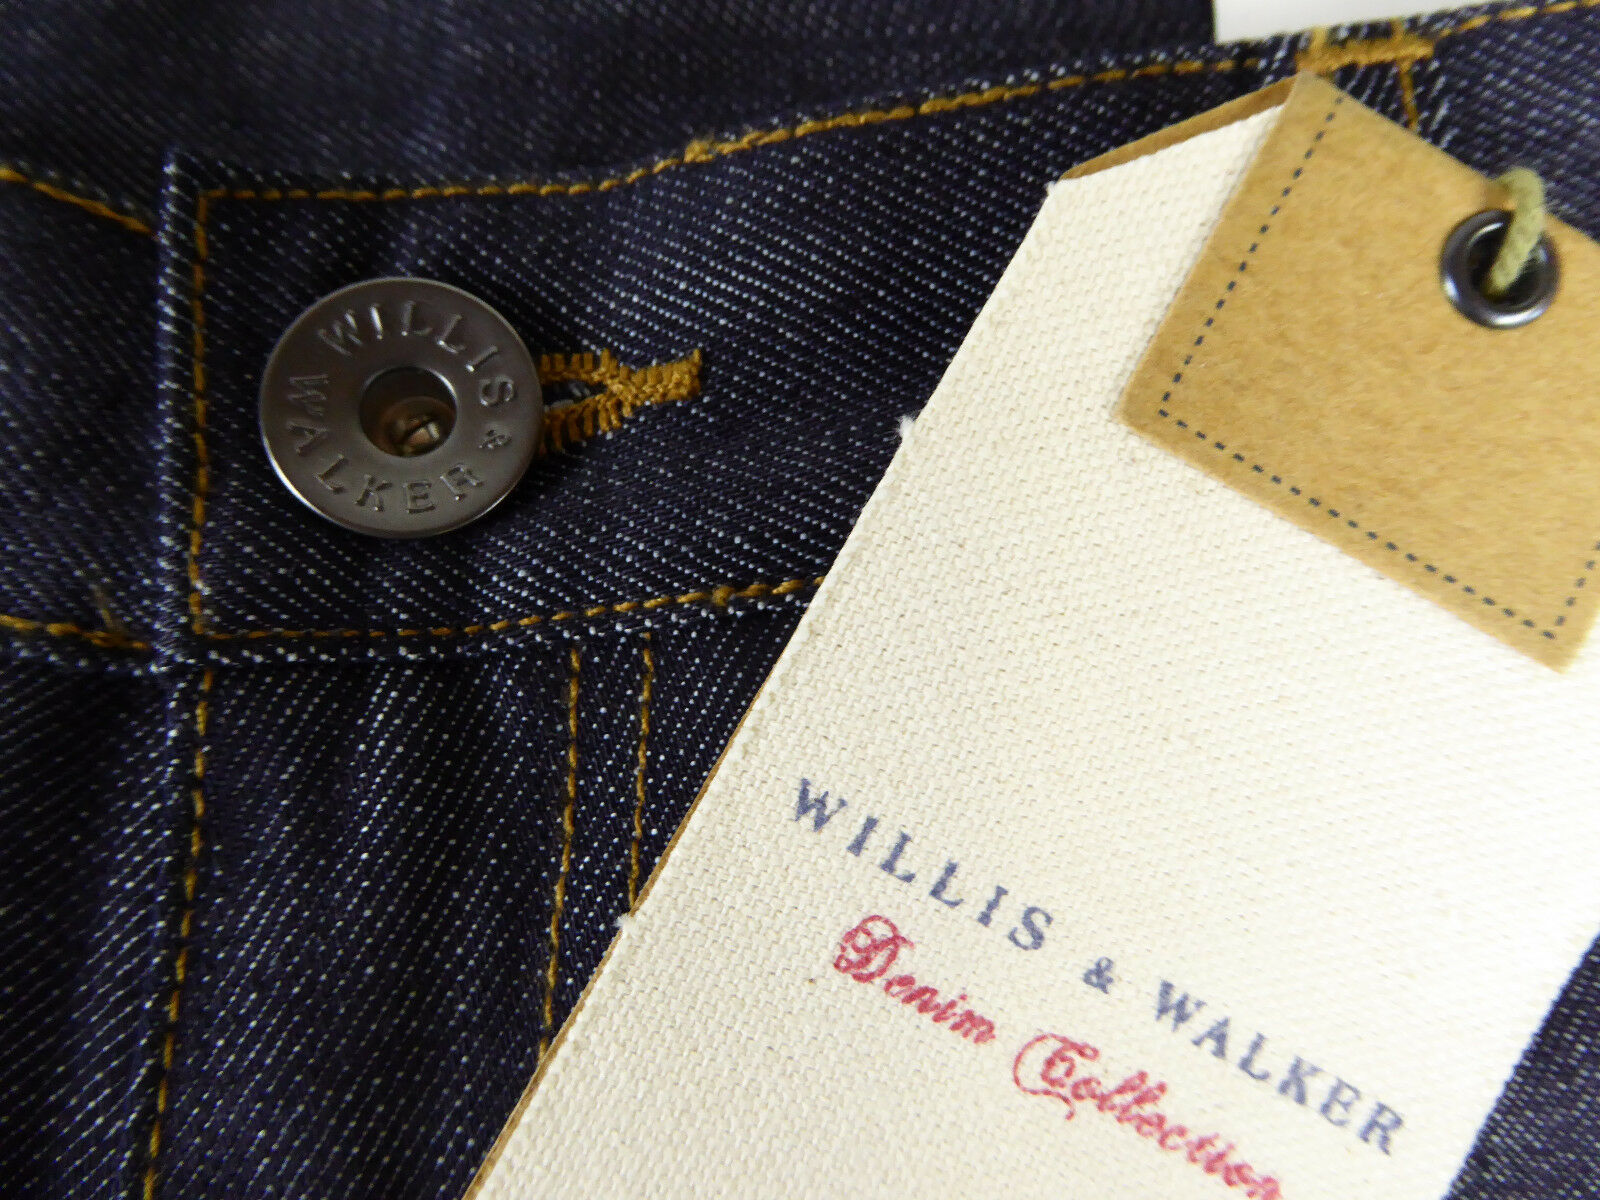 Willis & Walker Dark bluee Denim Jeans Straight Fit Twist  with Leather Badge